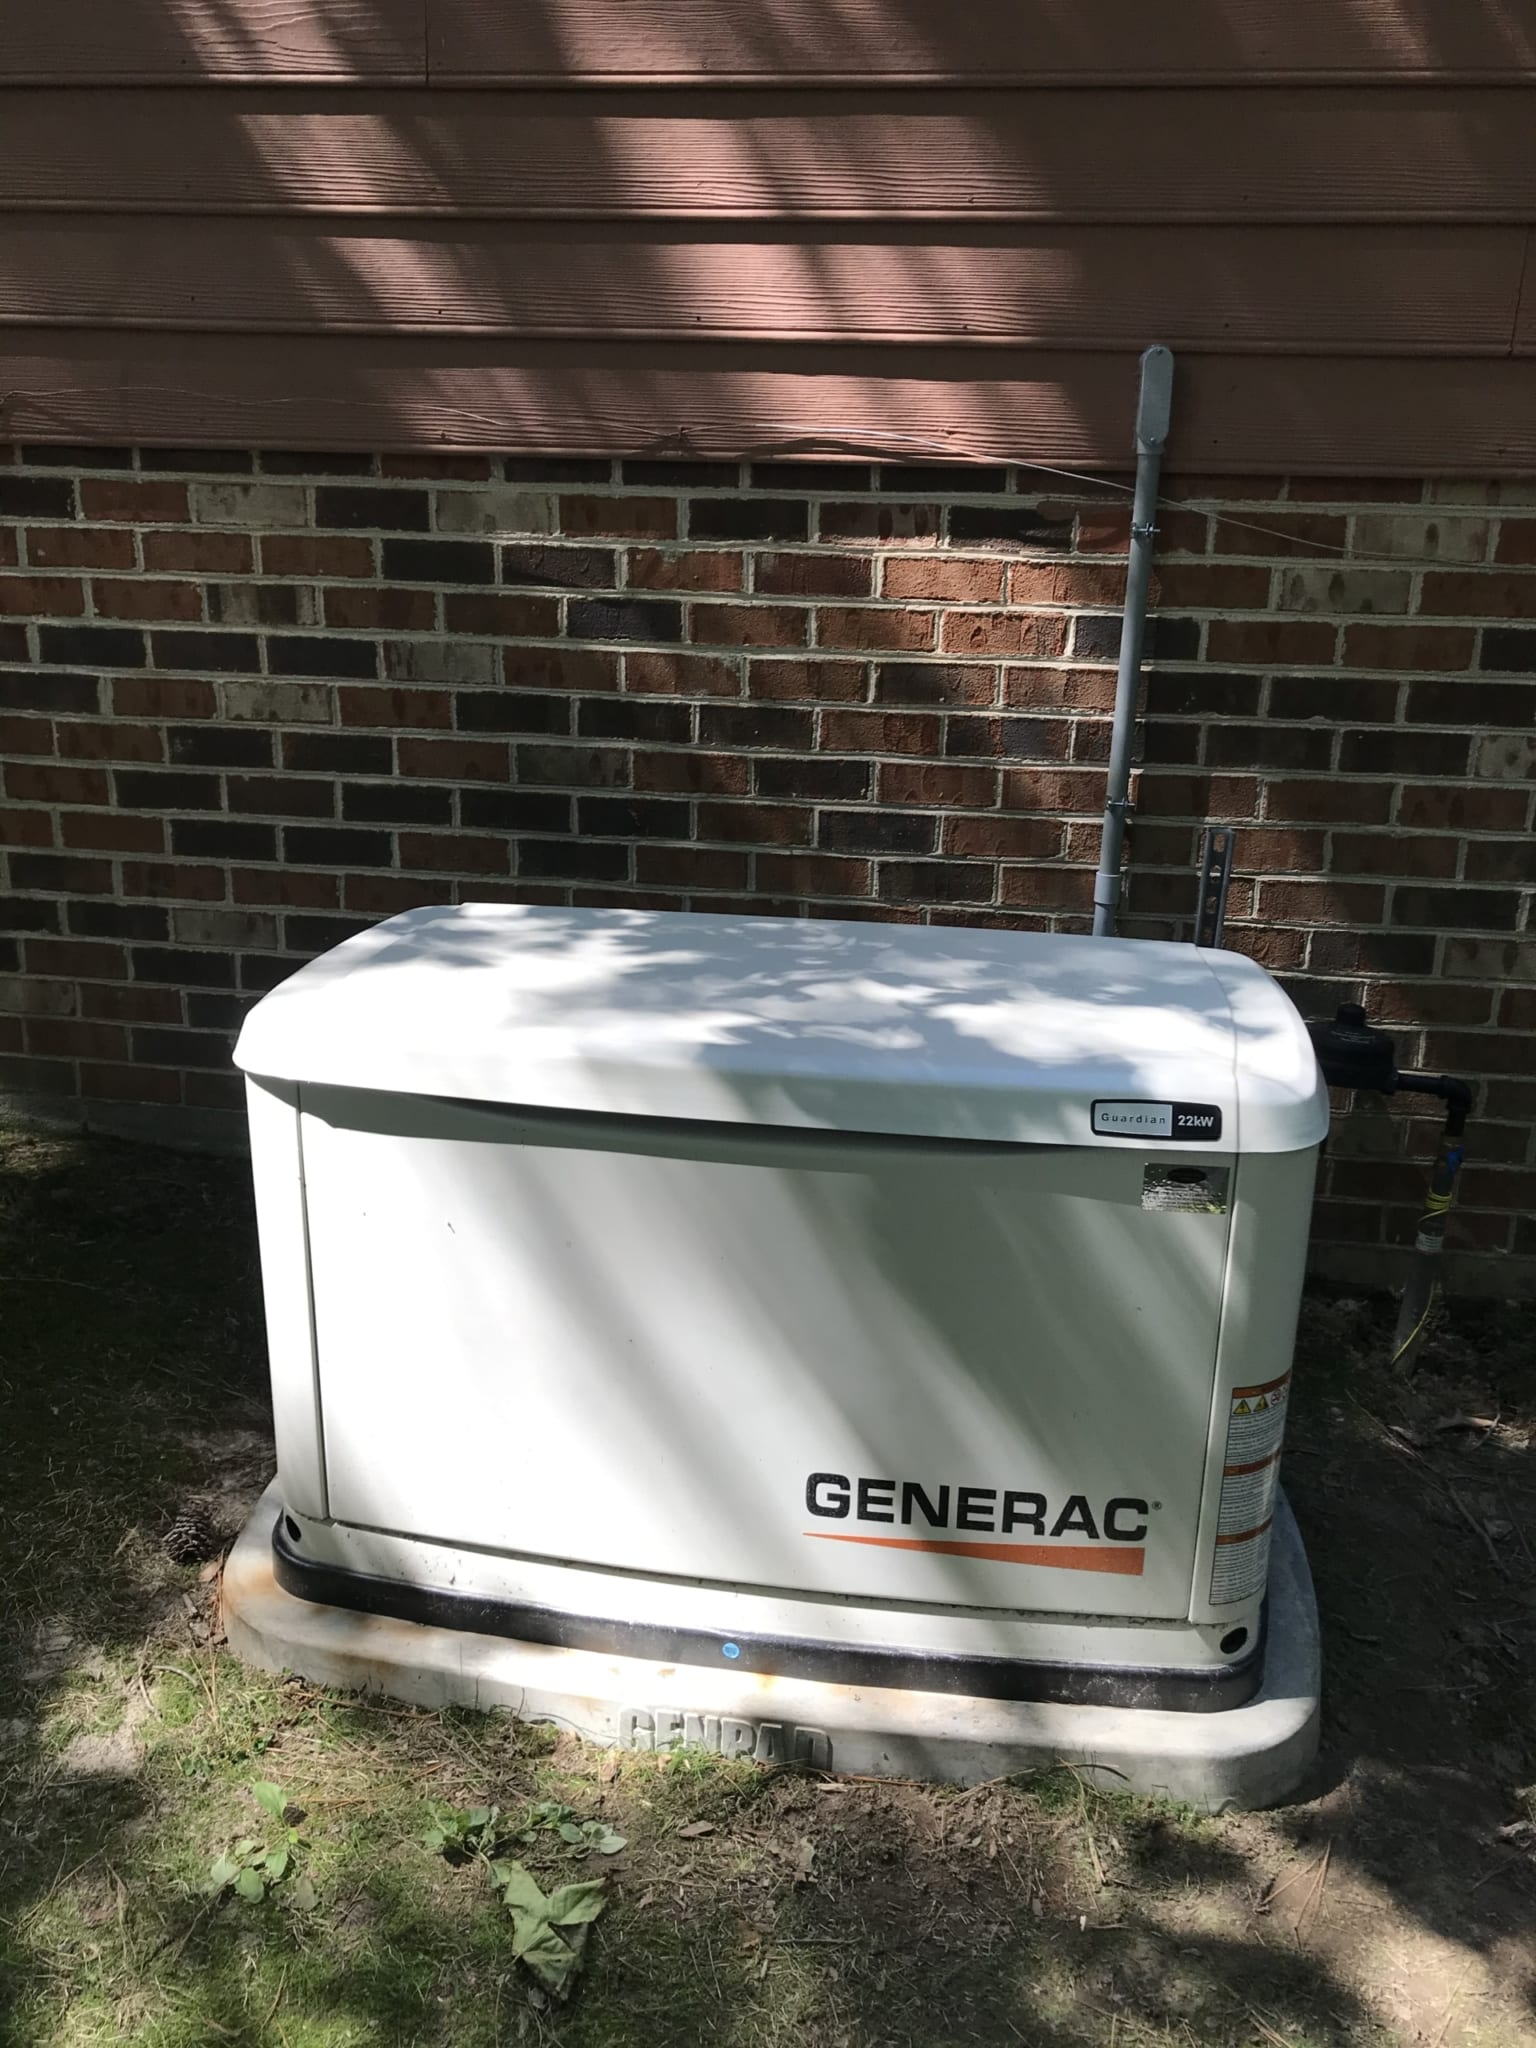 6.26.20 Generac Automatic Standby Generator